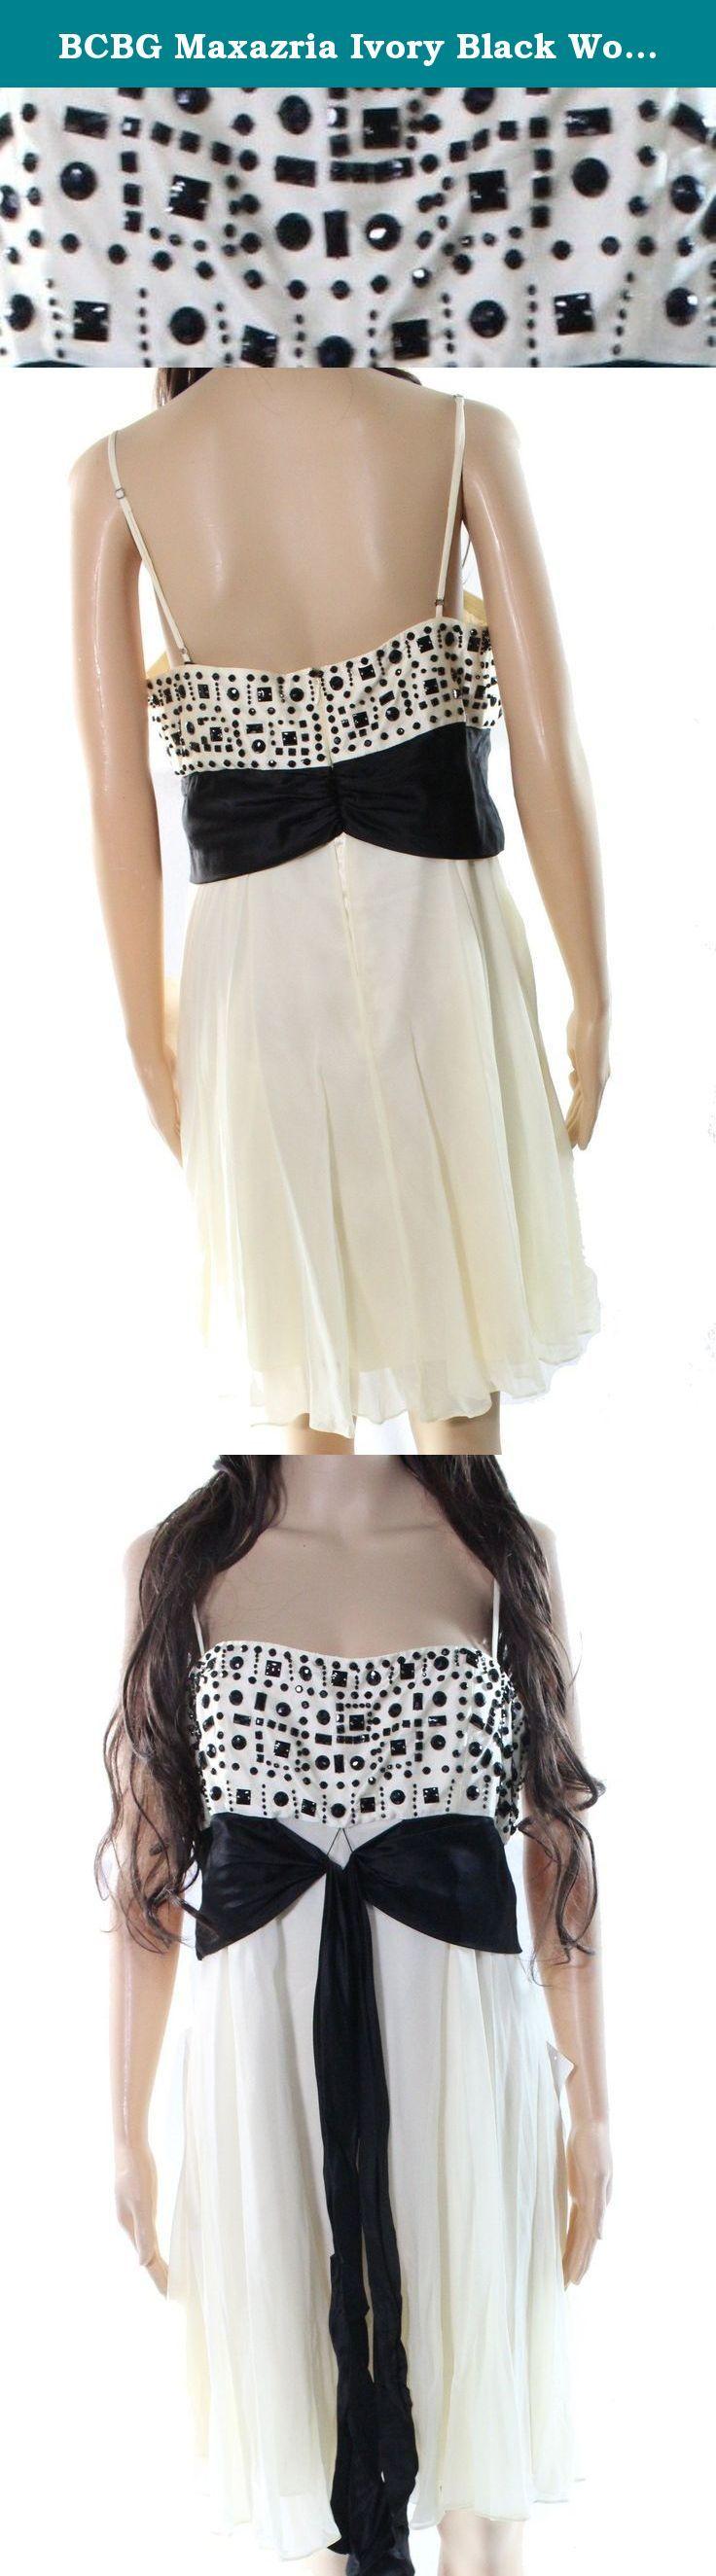 BCBG Maxazria Ivory Black Womens Empire Waist Silk Dress White Ivory 12. BCBG Maxazria Ivory Black Womens Empire Waist Silk Dress White Ivory 12.